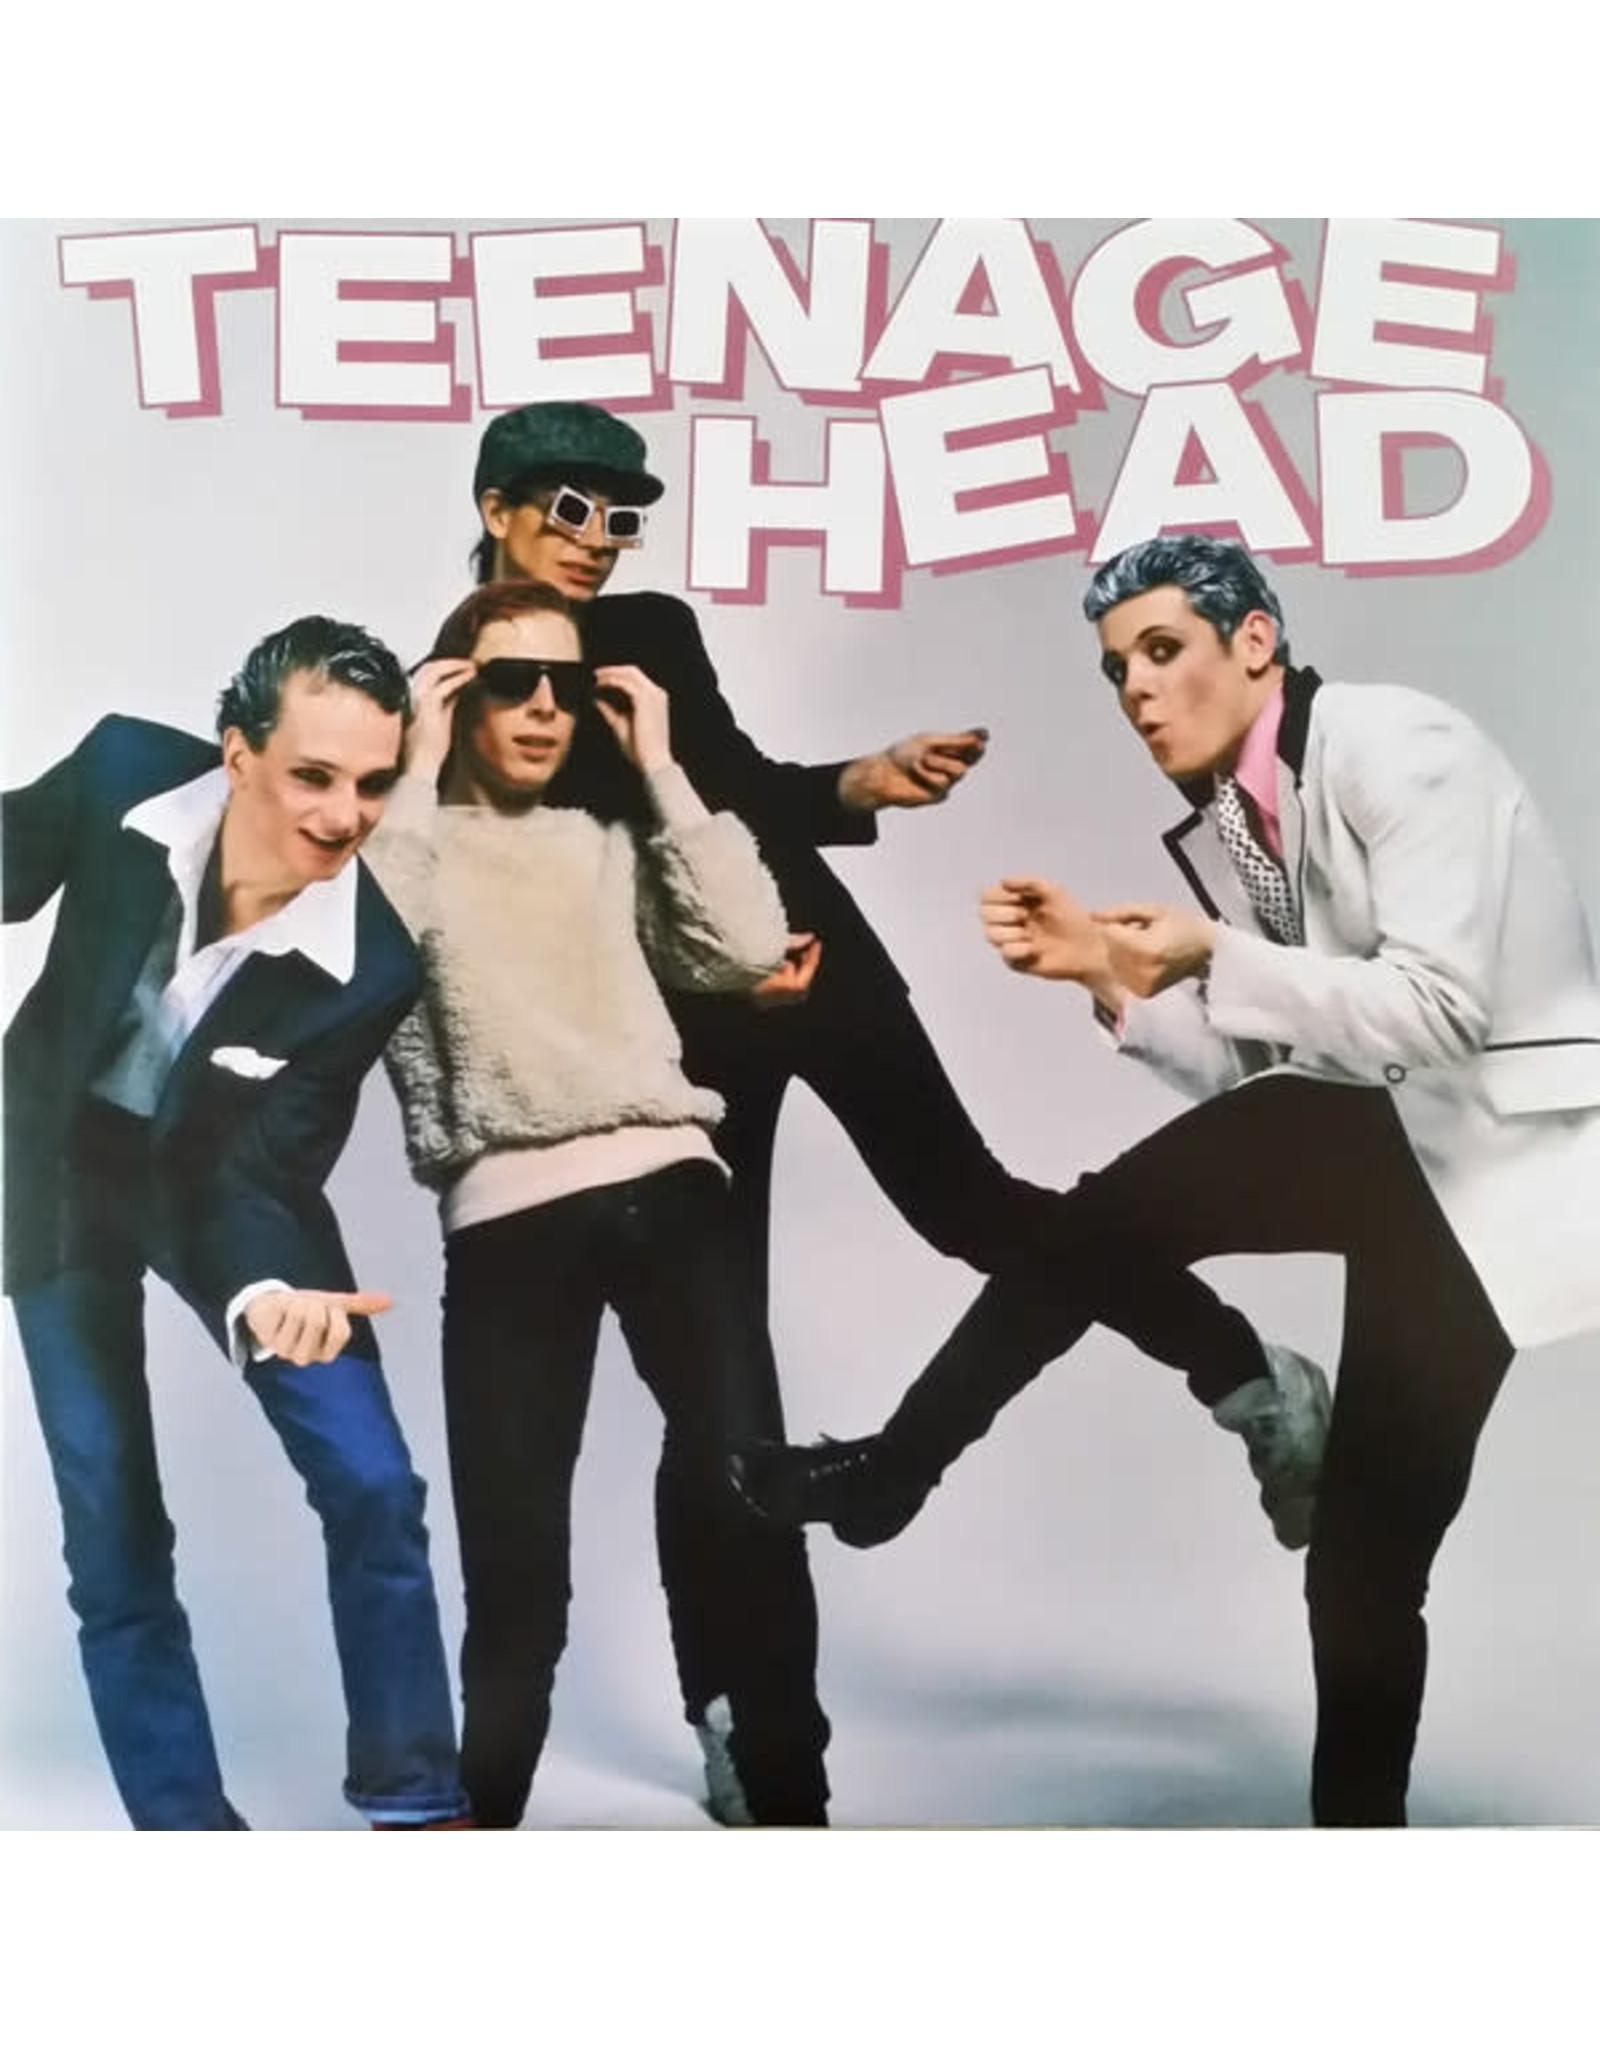 "Teenage Head - S/T (2LP+7"") LP"